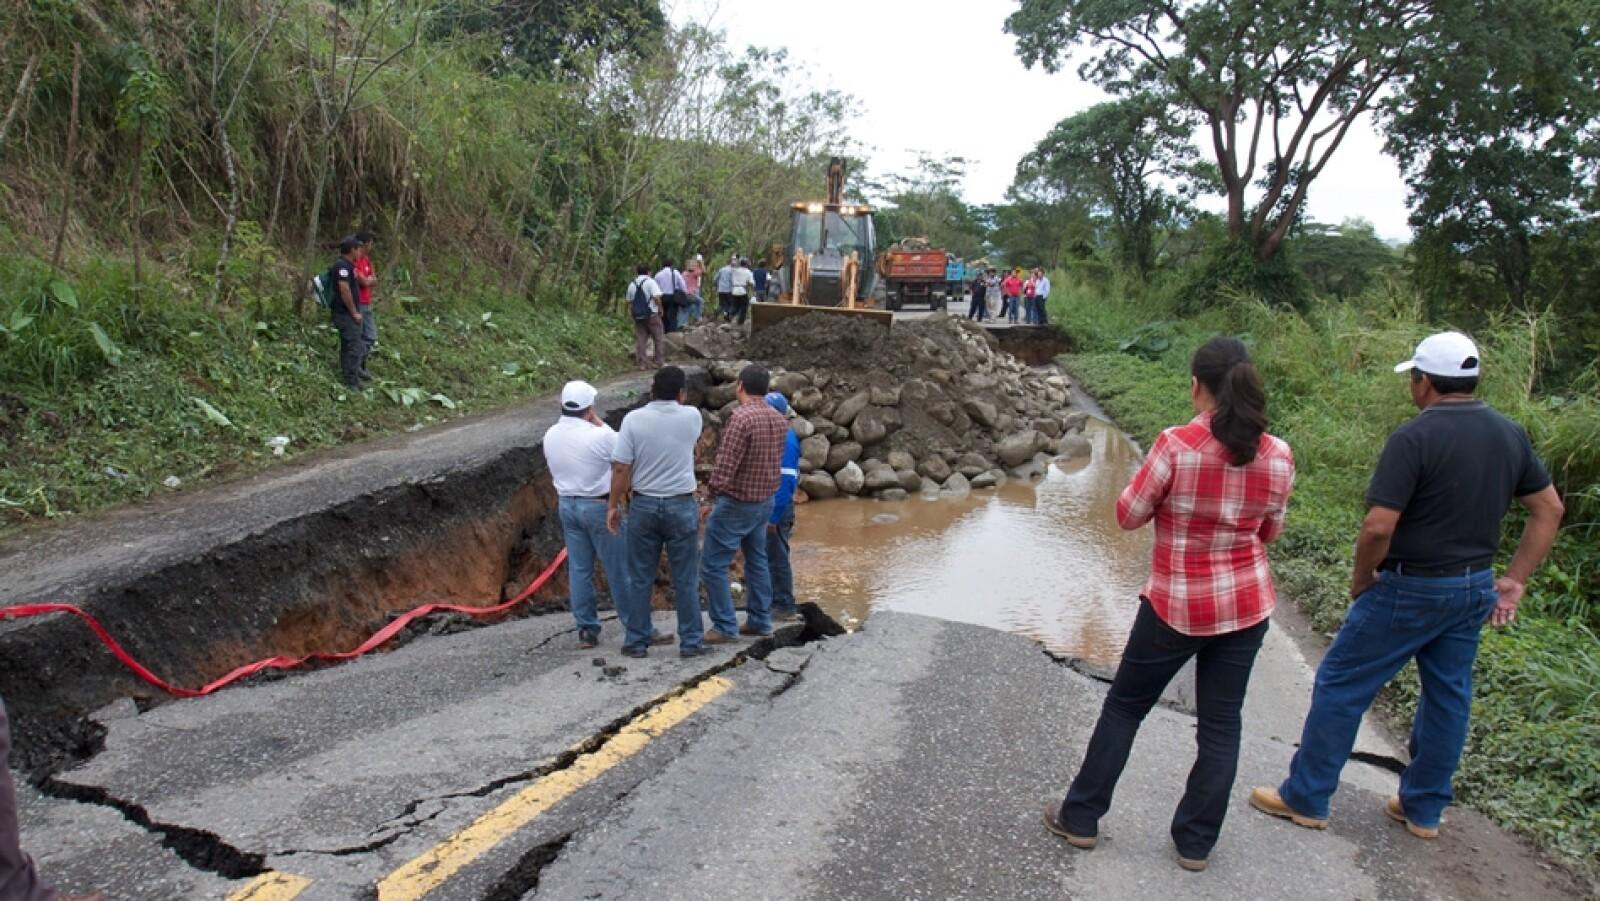 colapso de carretera en chiapas